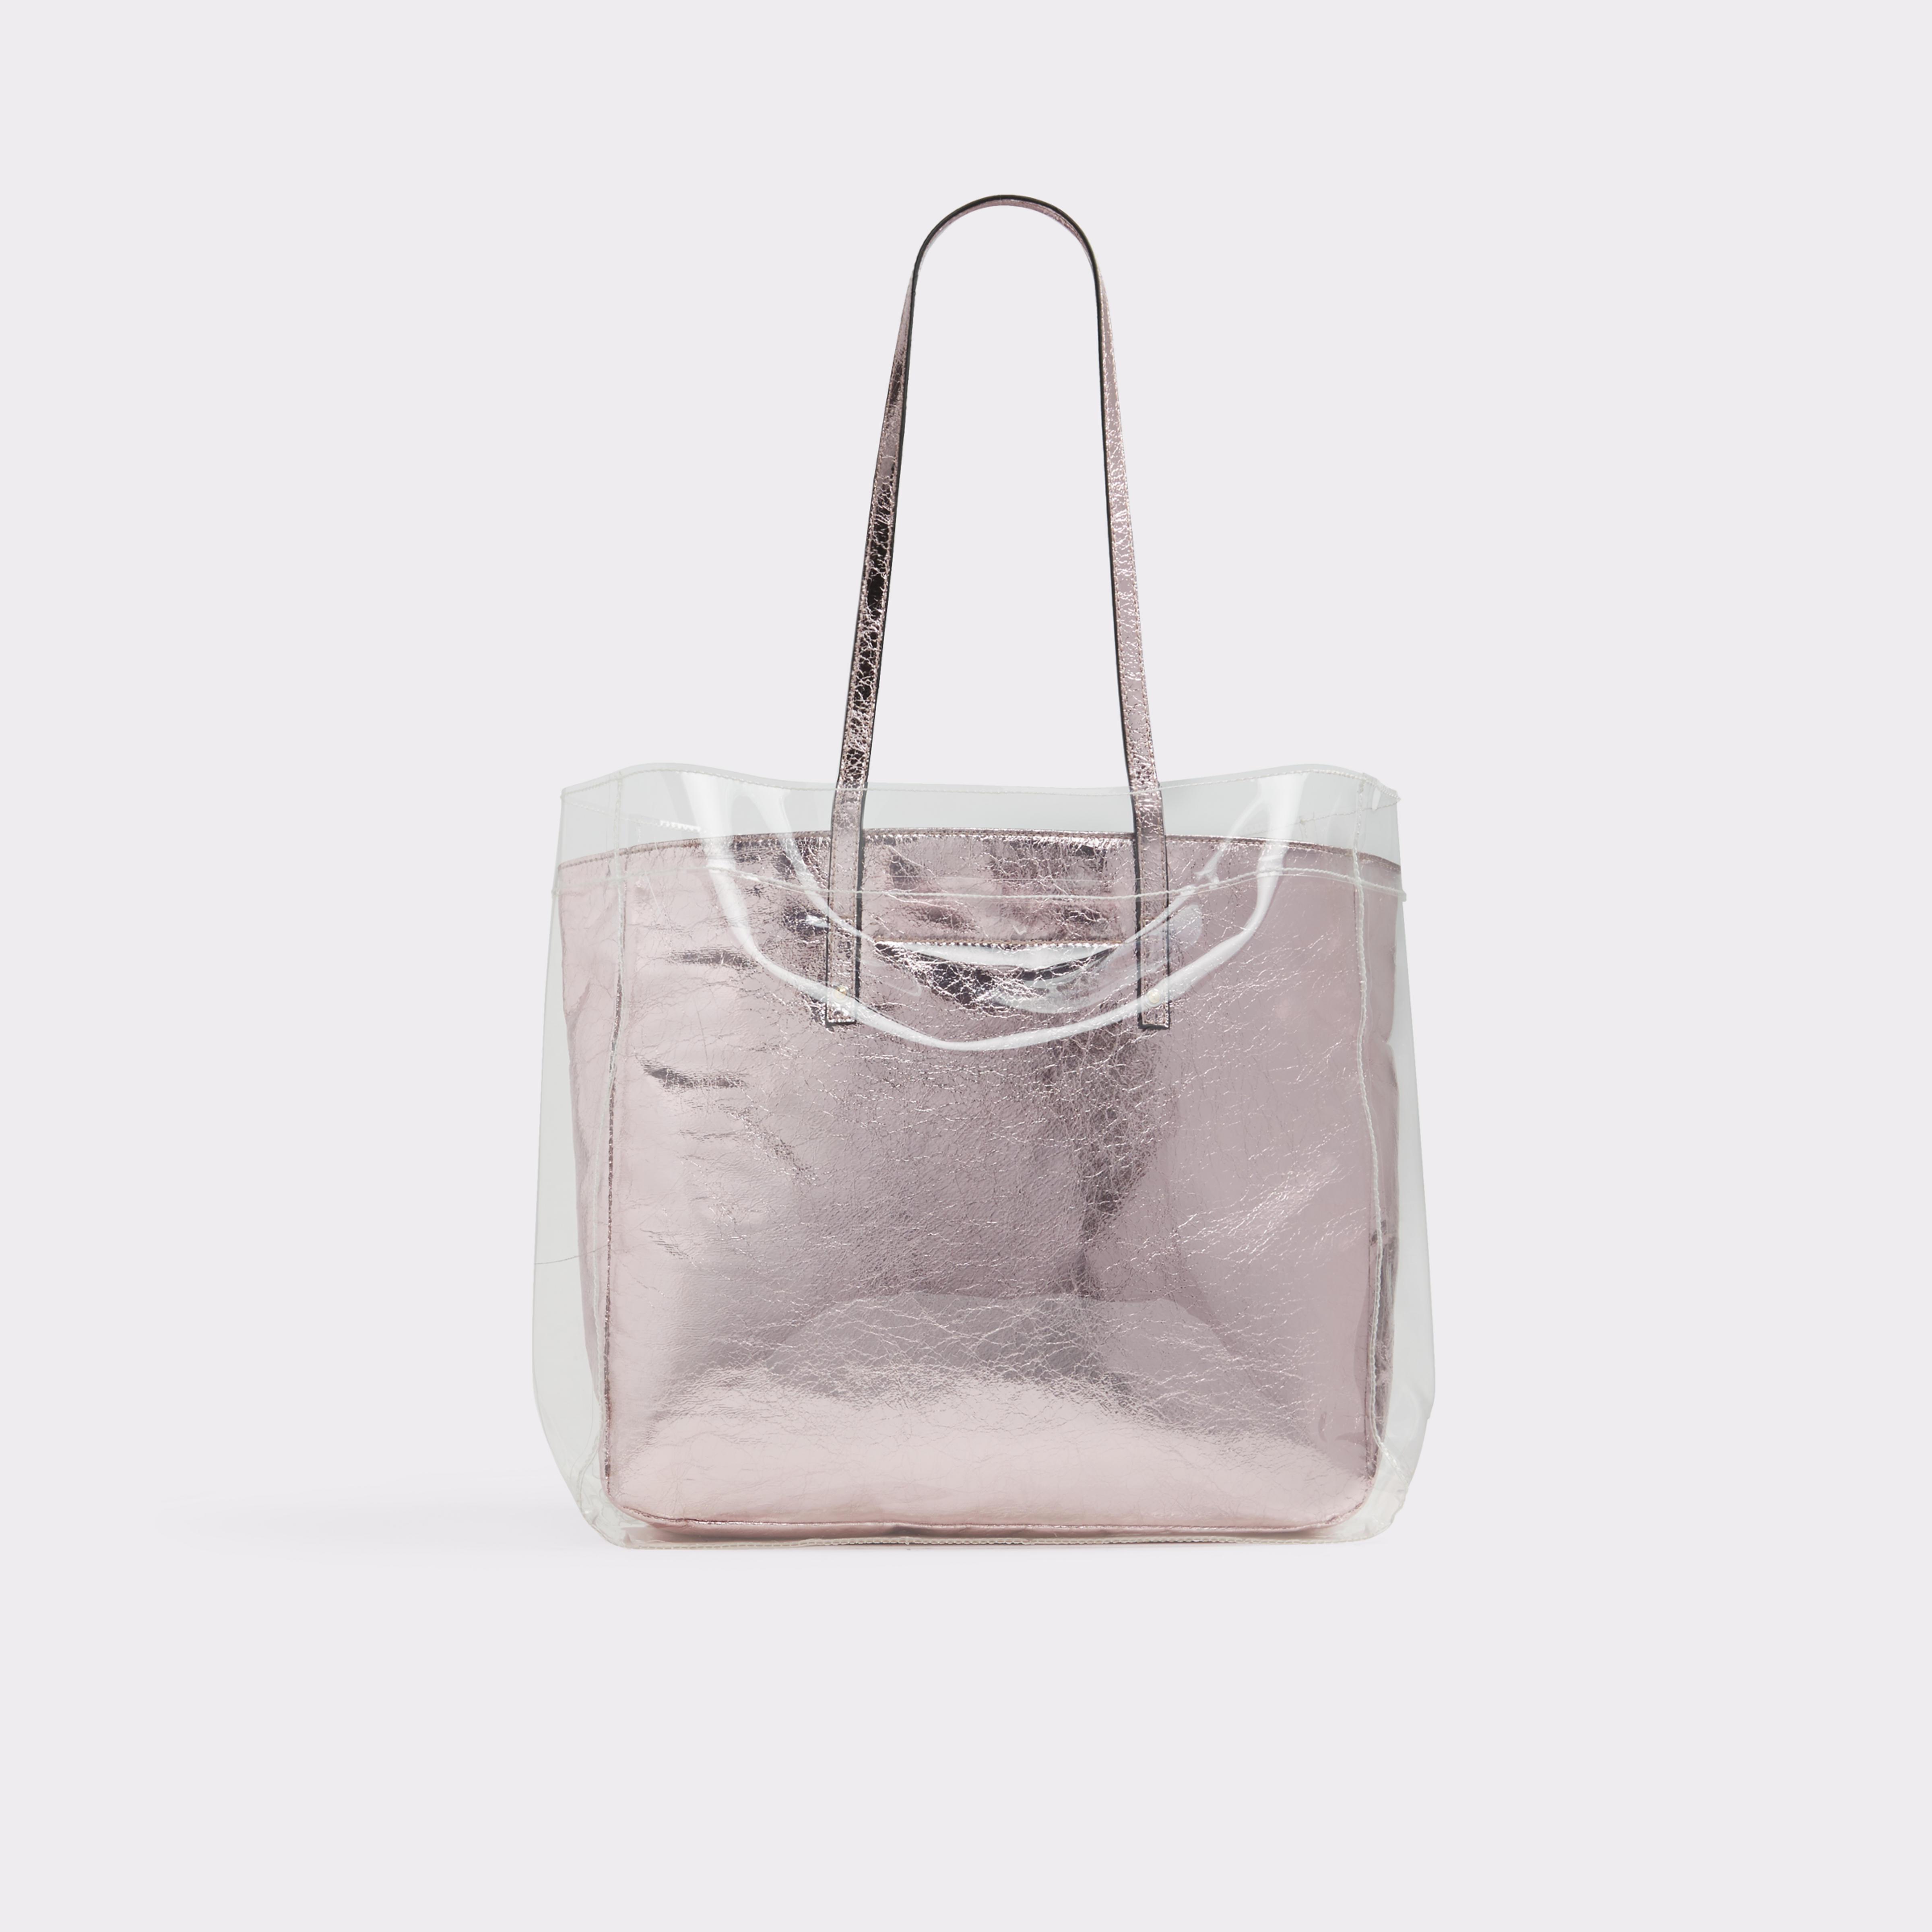 Aldo Las Handbags Handbag Galleries